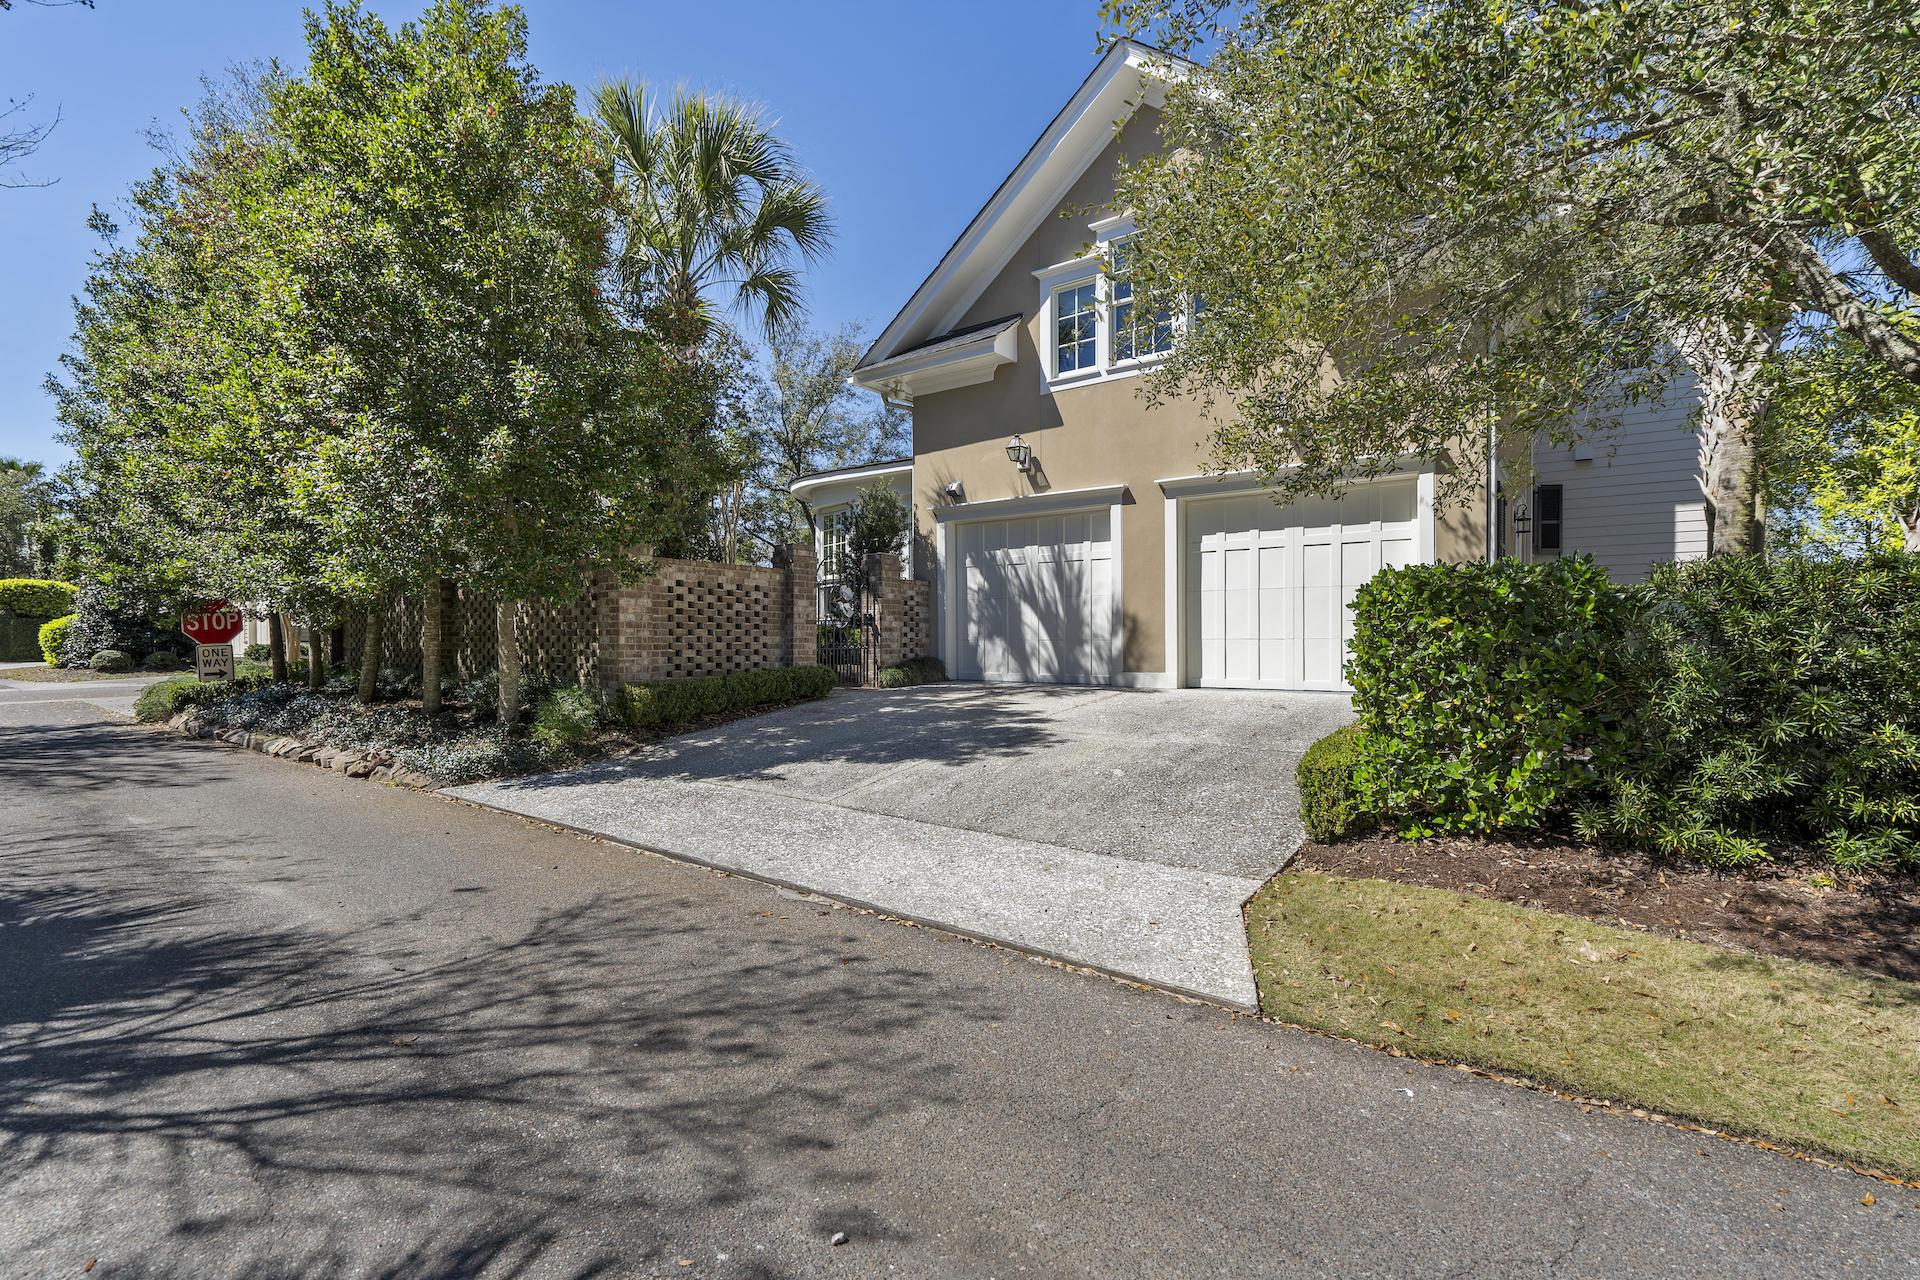 Daniel Island Homes For Sale - 623 Island Park, Charleston, SC - 1